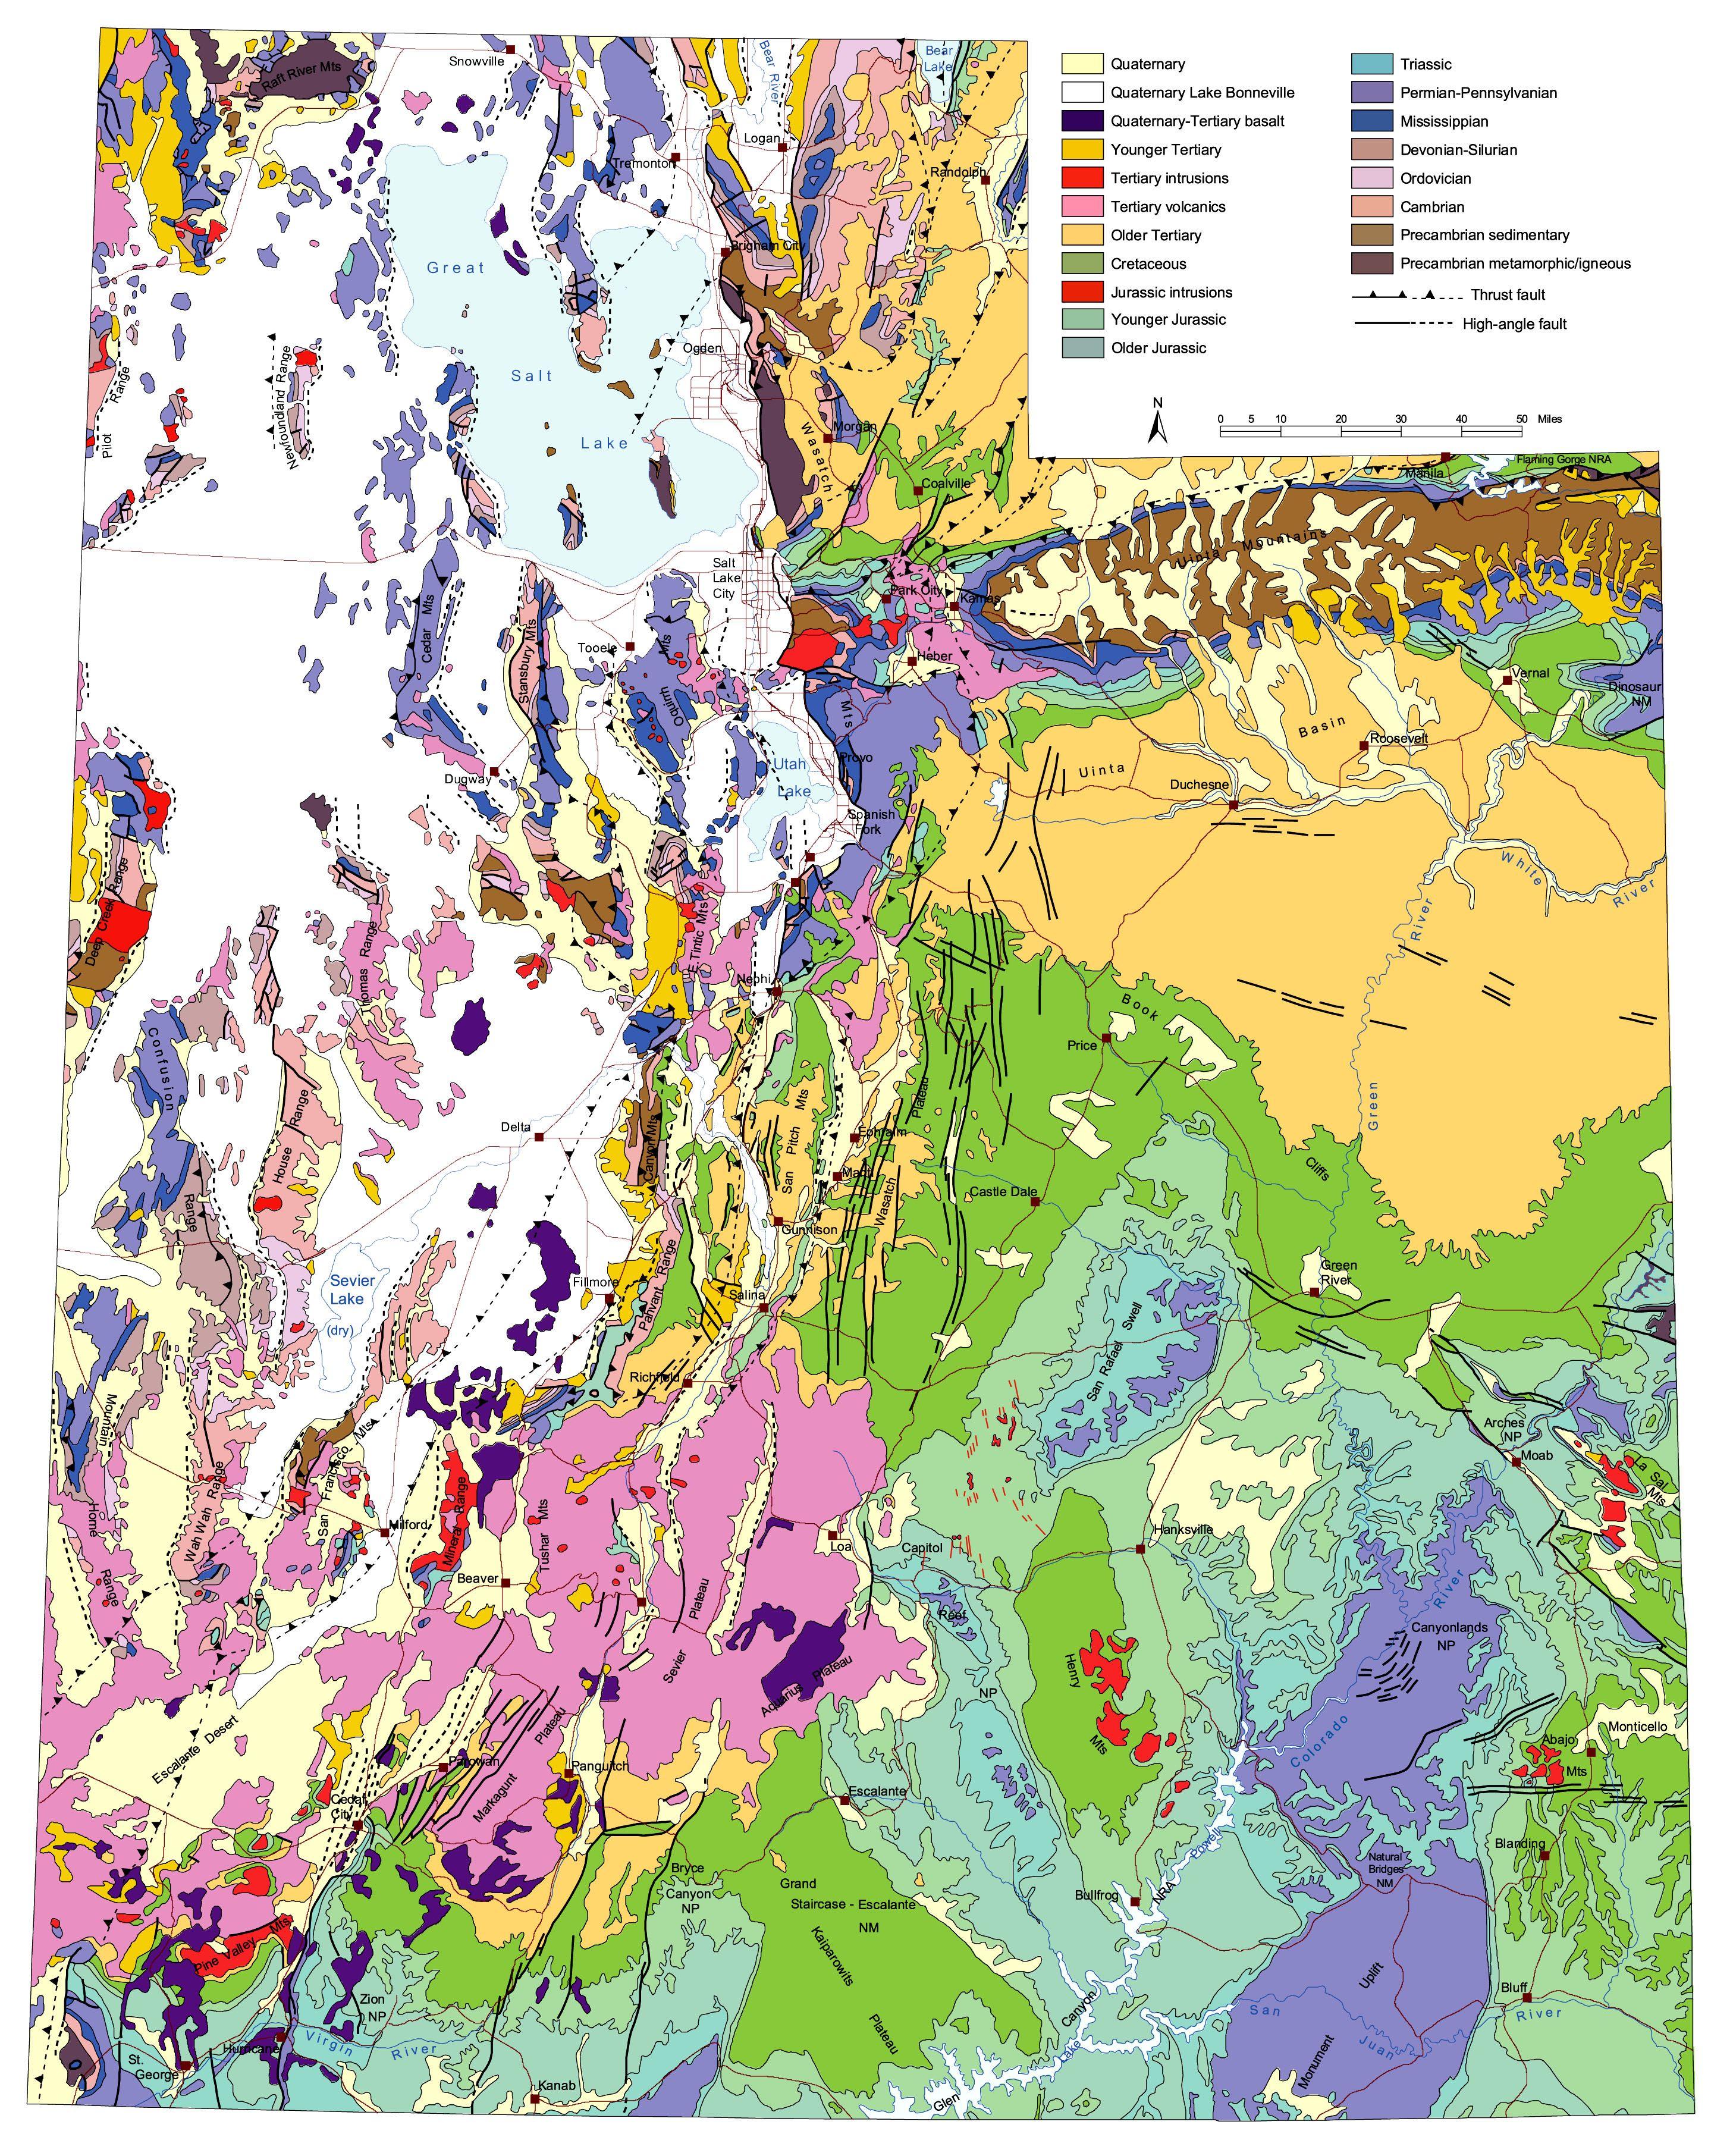 Cambrian Paleogeographic Map Of The Colorado Plateau By Ron Blakey - Map of colorado plateau region